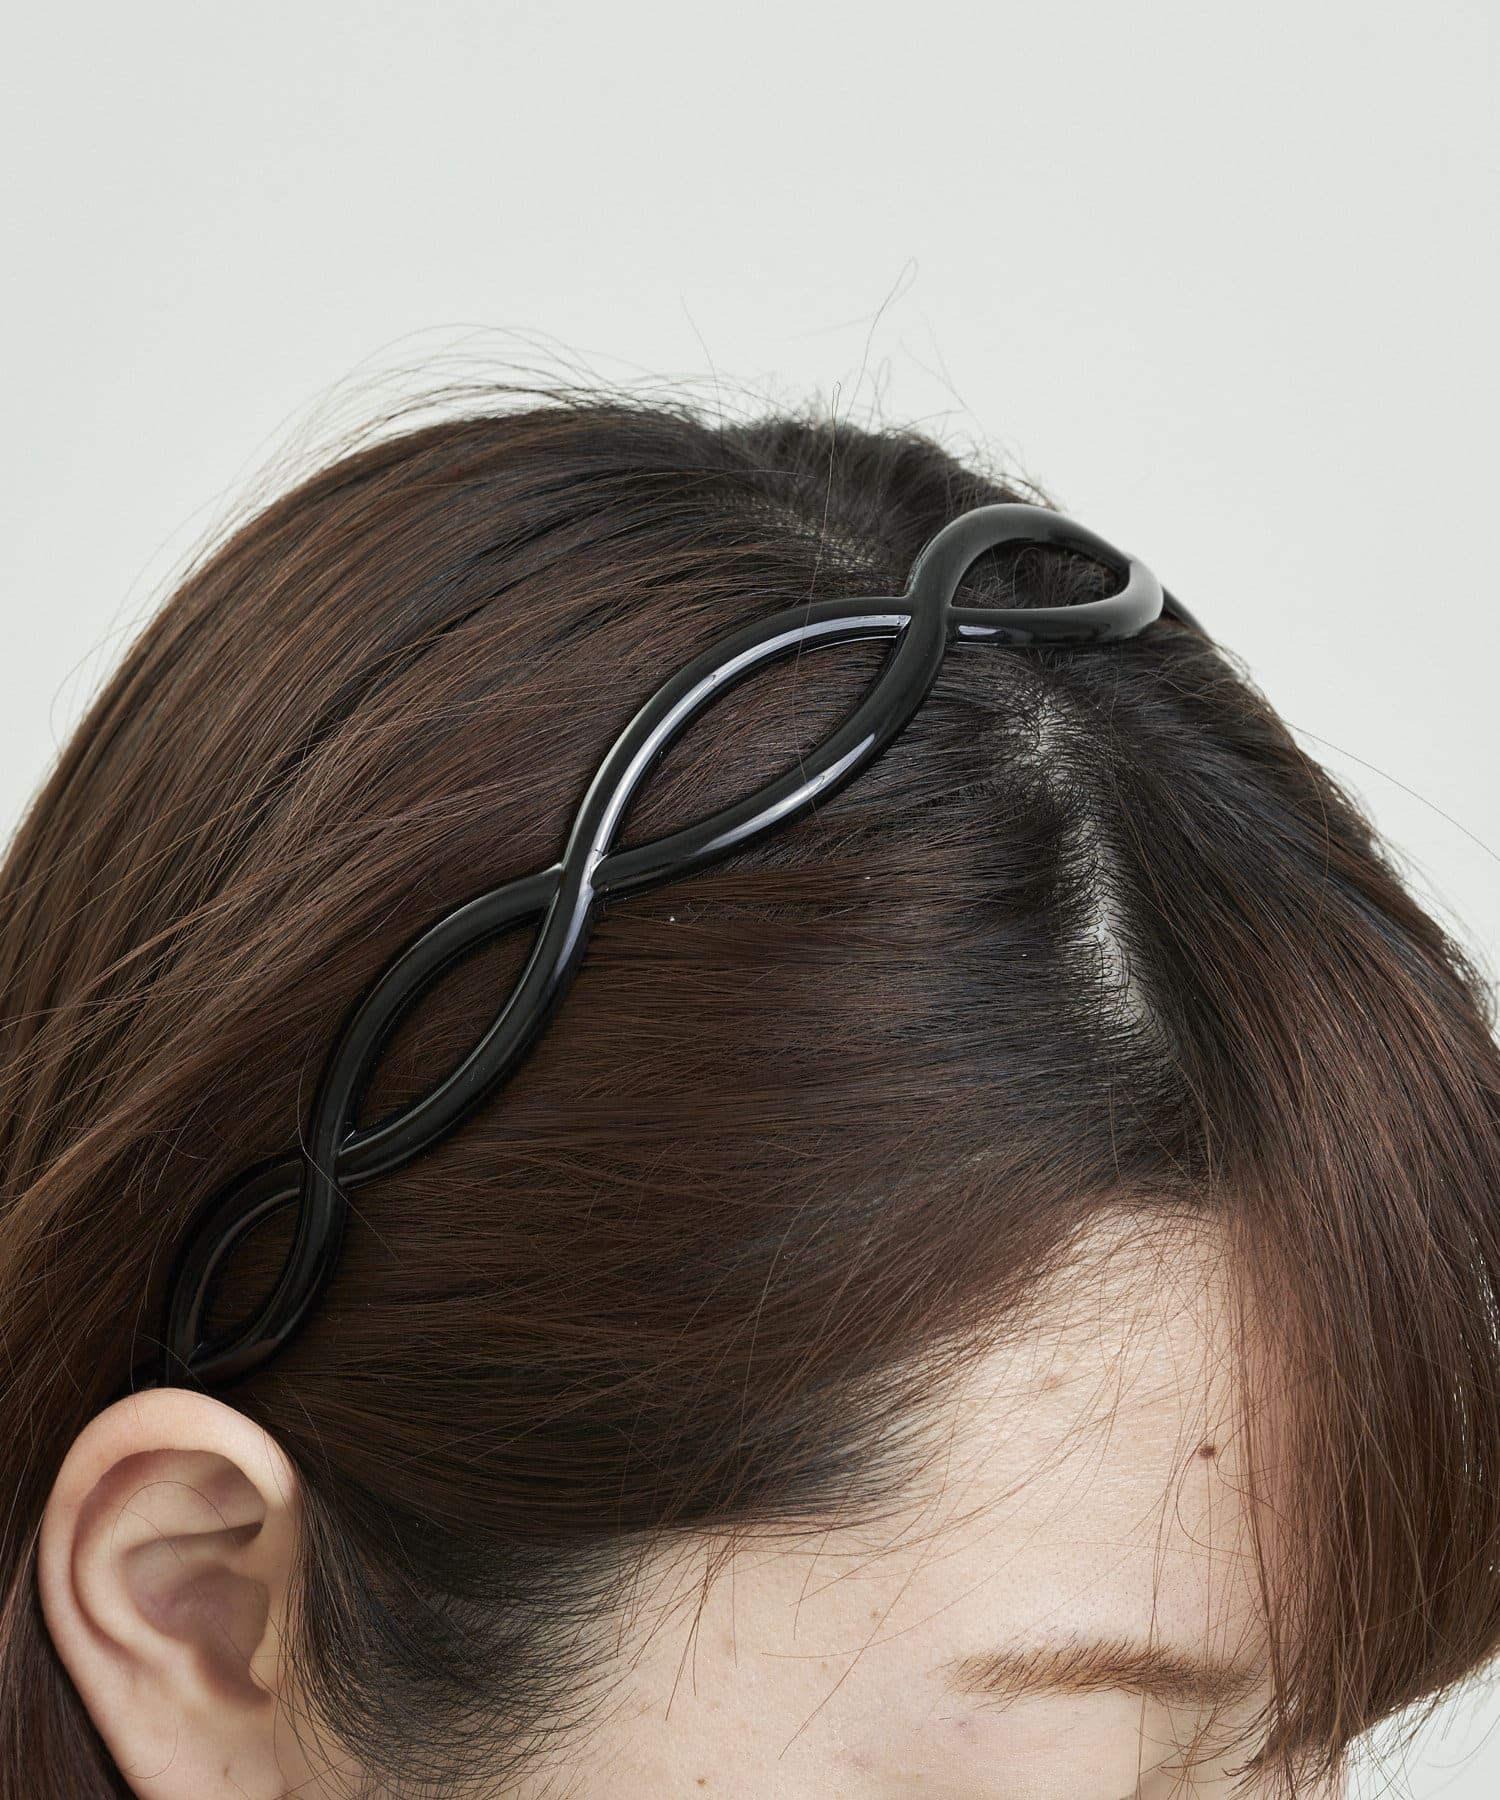 3COINS(スリーコインズ) ライフスタイル アクリルカチューシャ ブラック